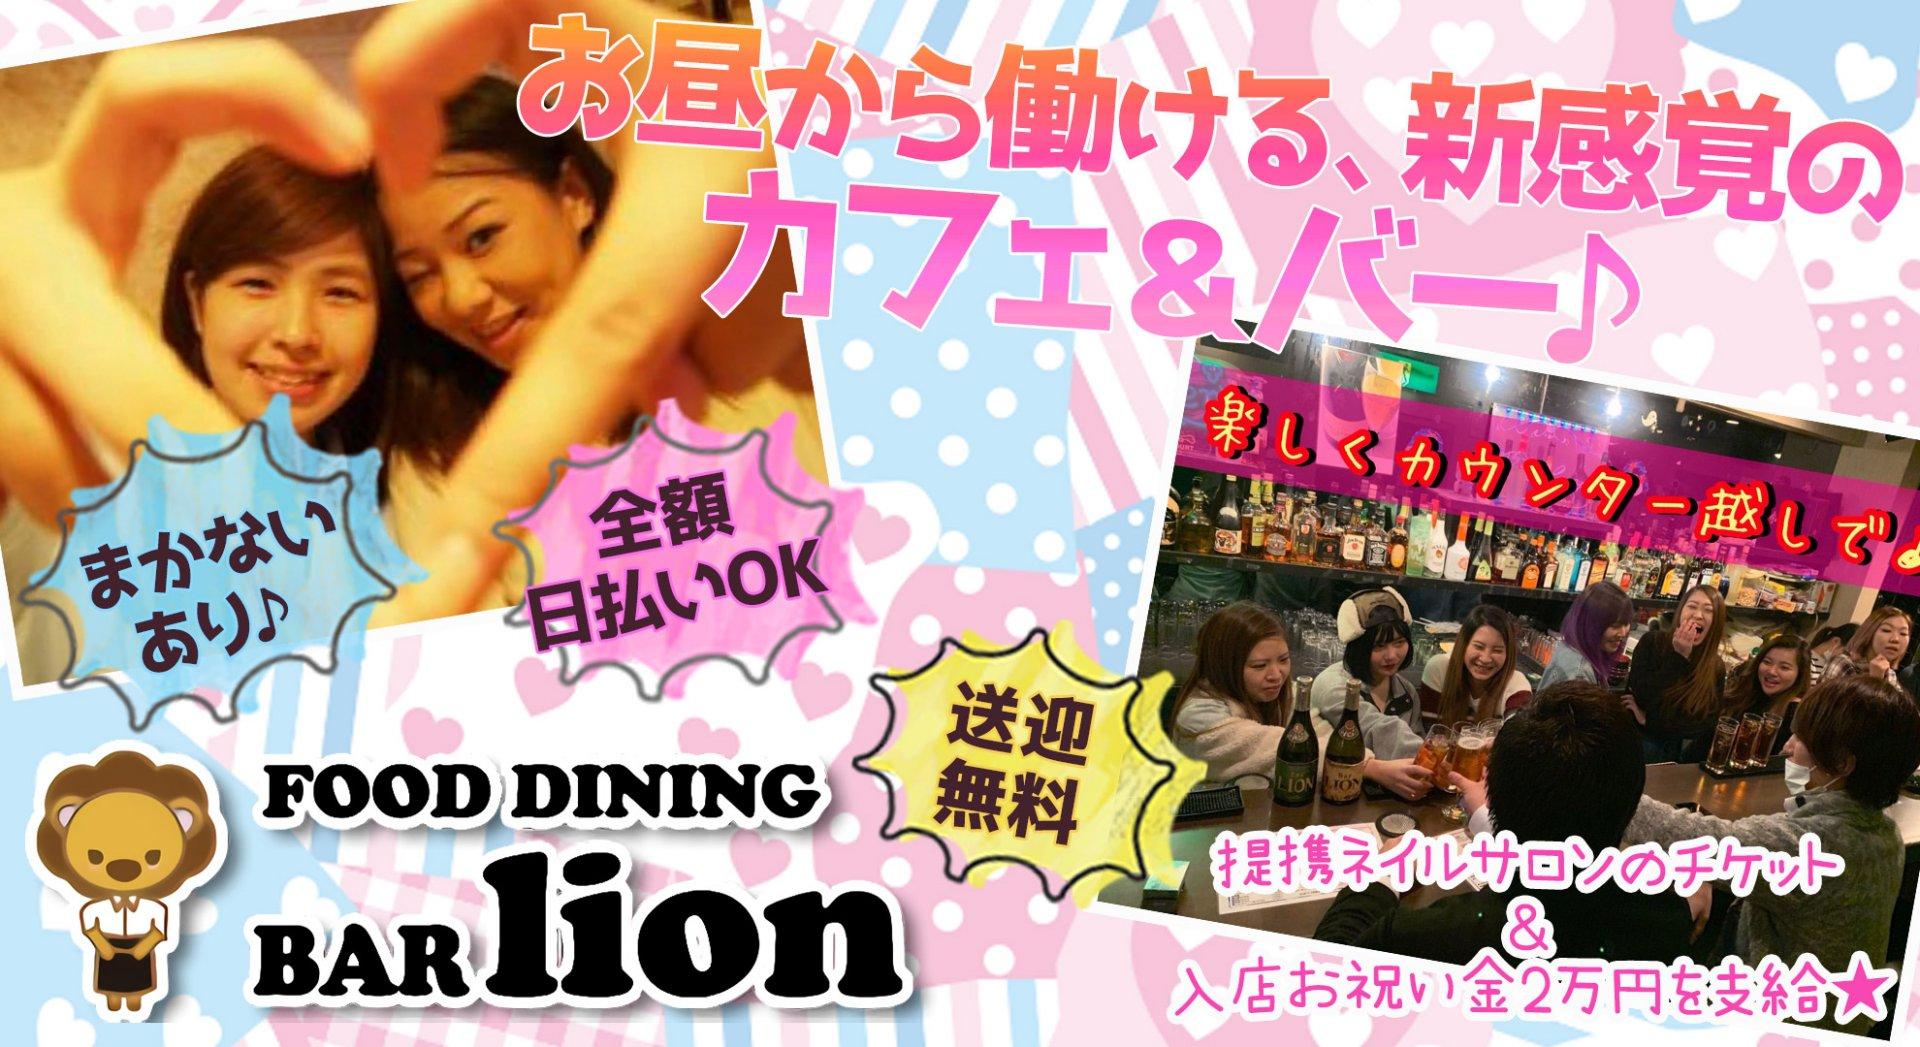 Girl's Bar lion<リオン> 川崎 ガールズバー TOP画像